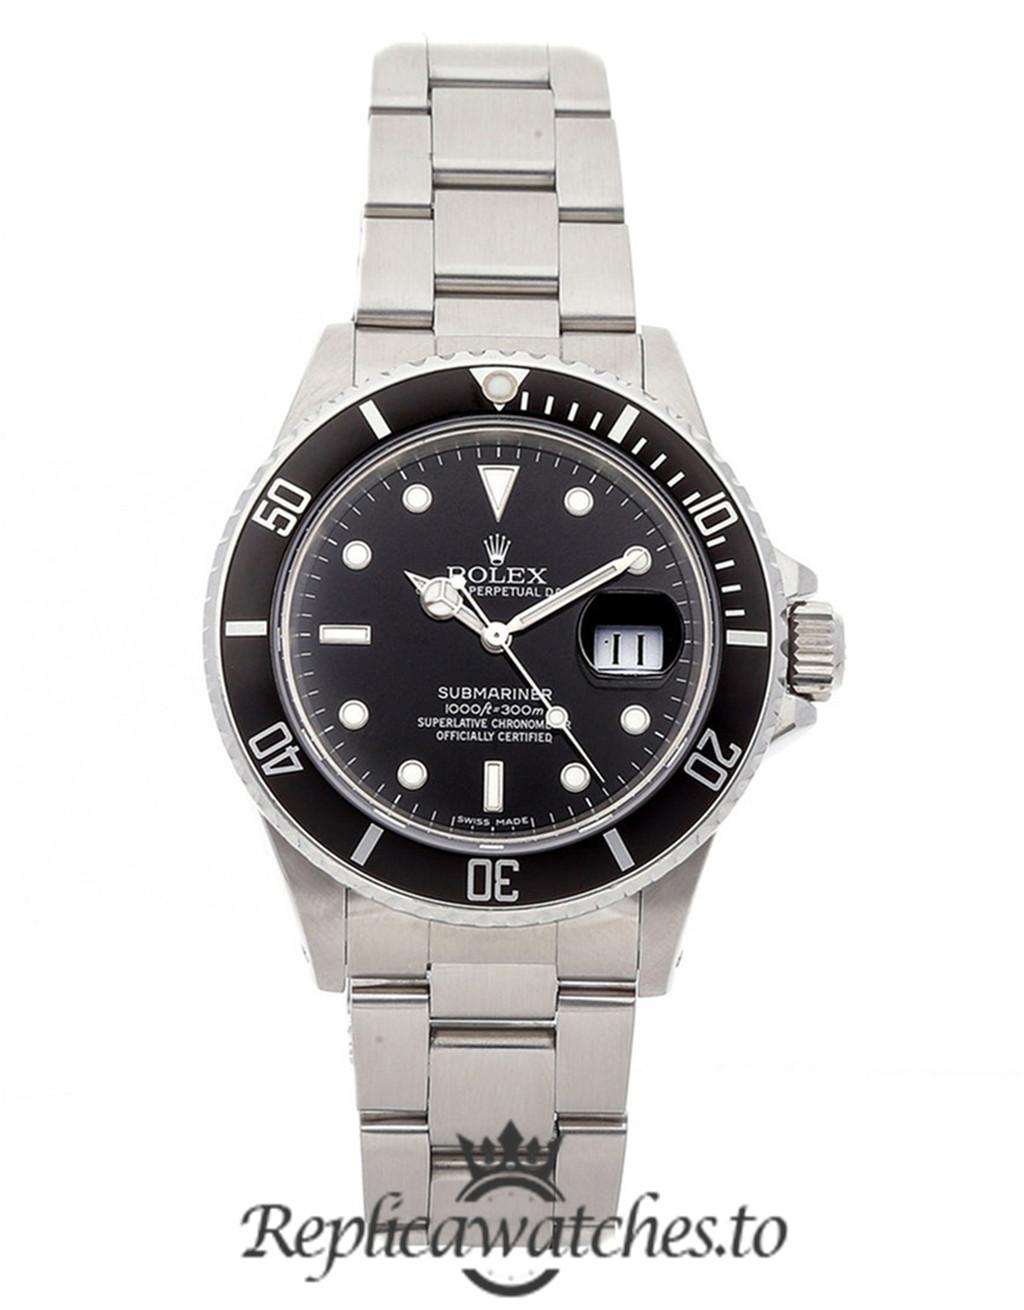 Rolex Submariner Replica 16800 Black Bezel 40MM